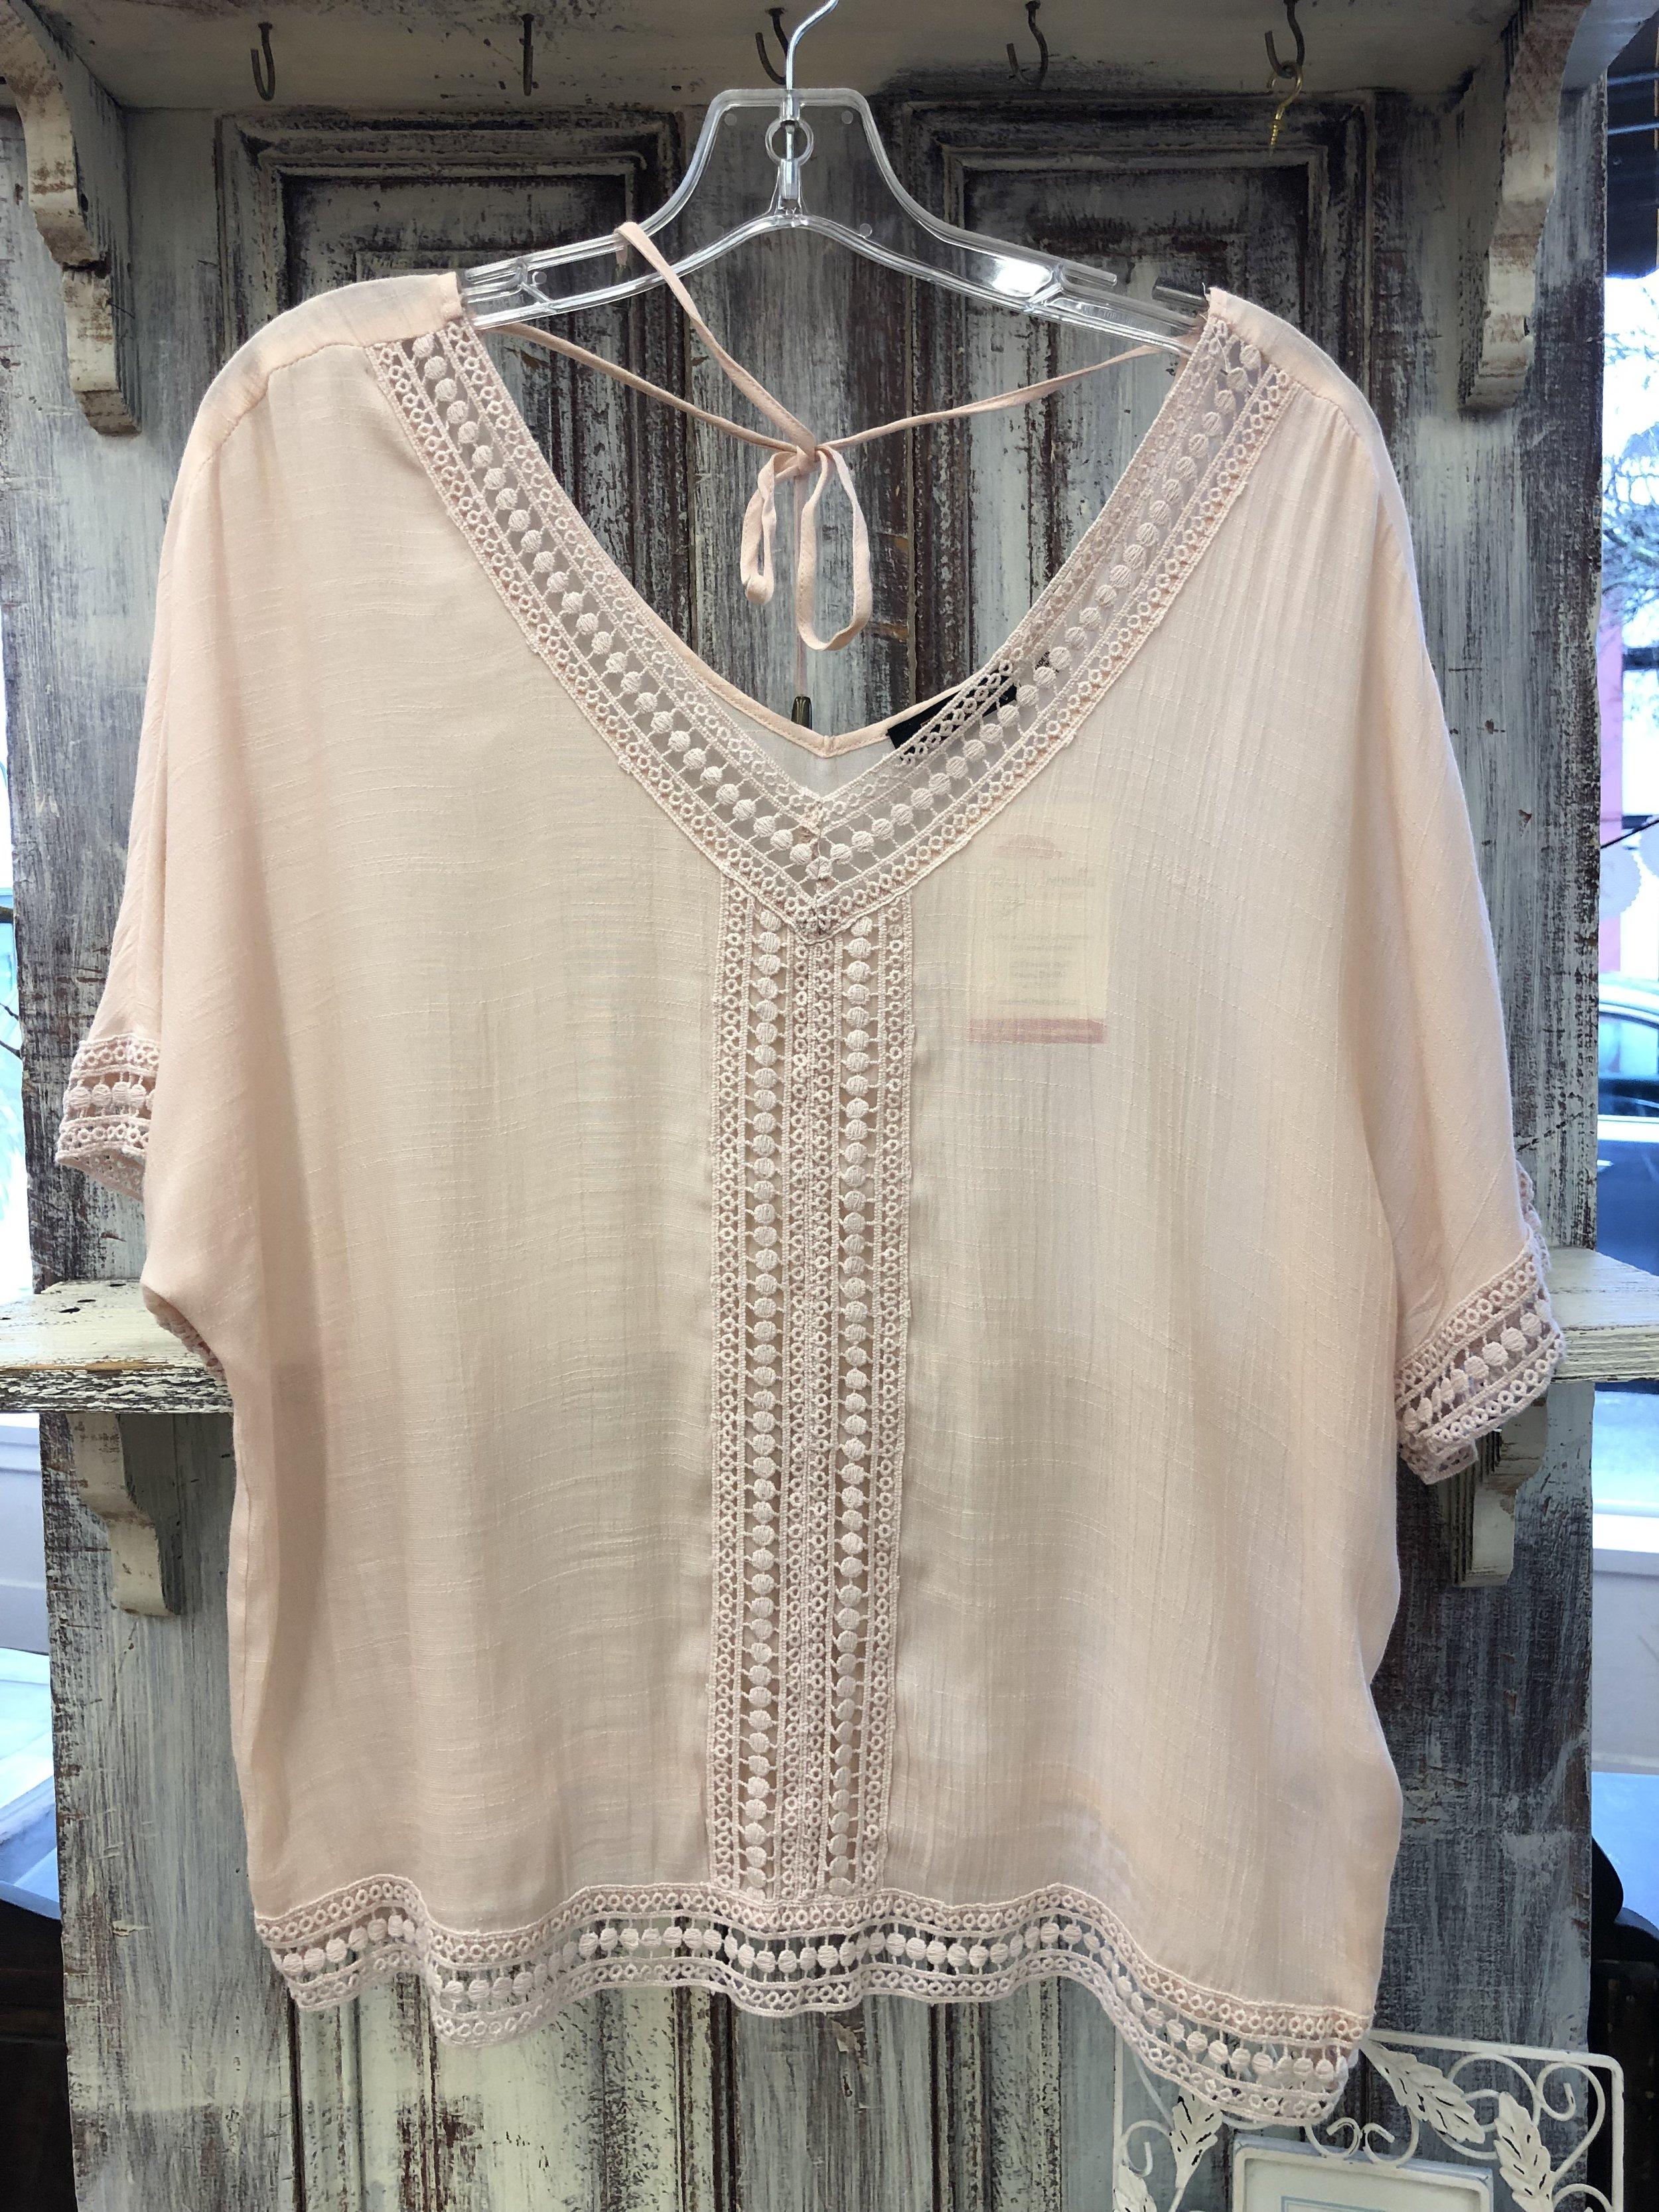 FYLO - Crochet Boho - Small - $15.99